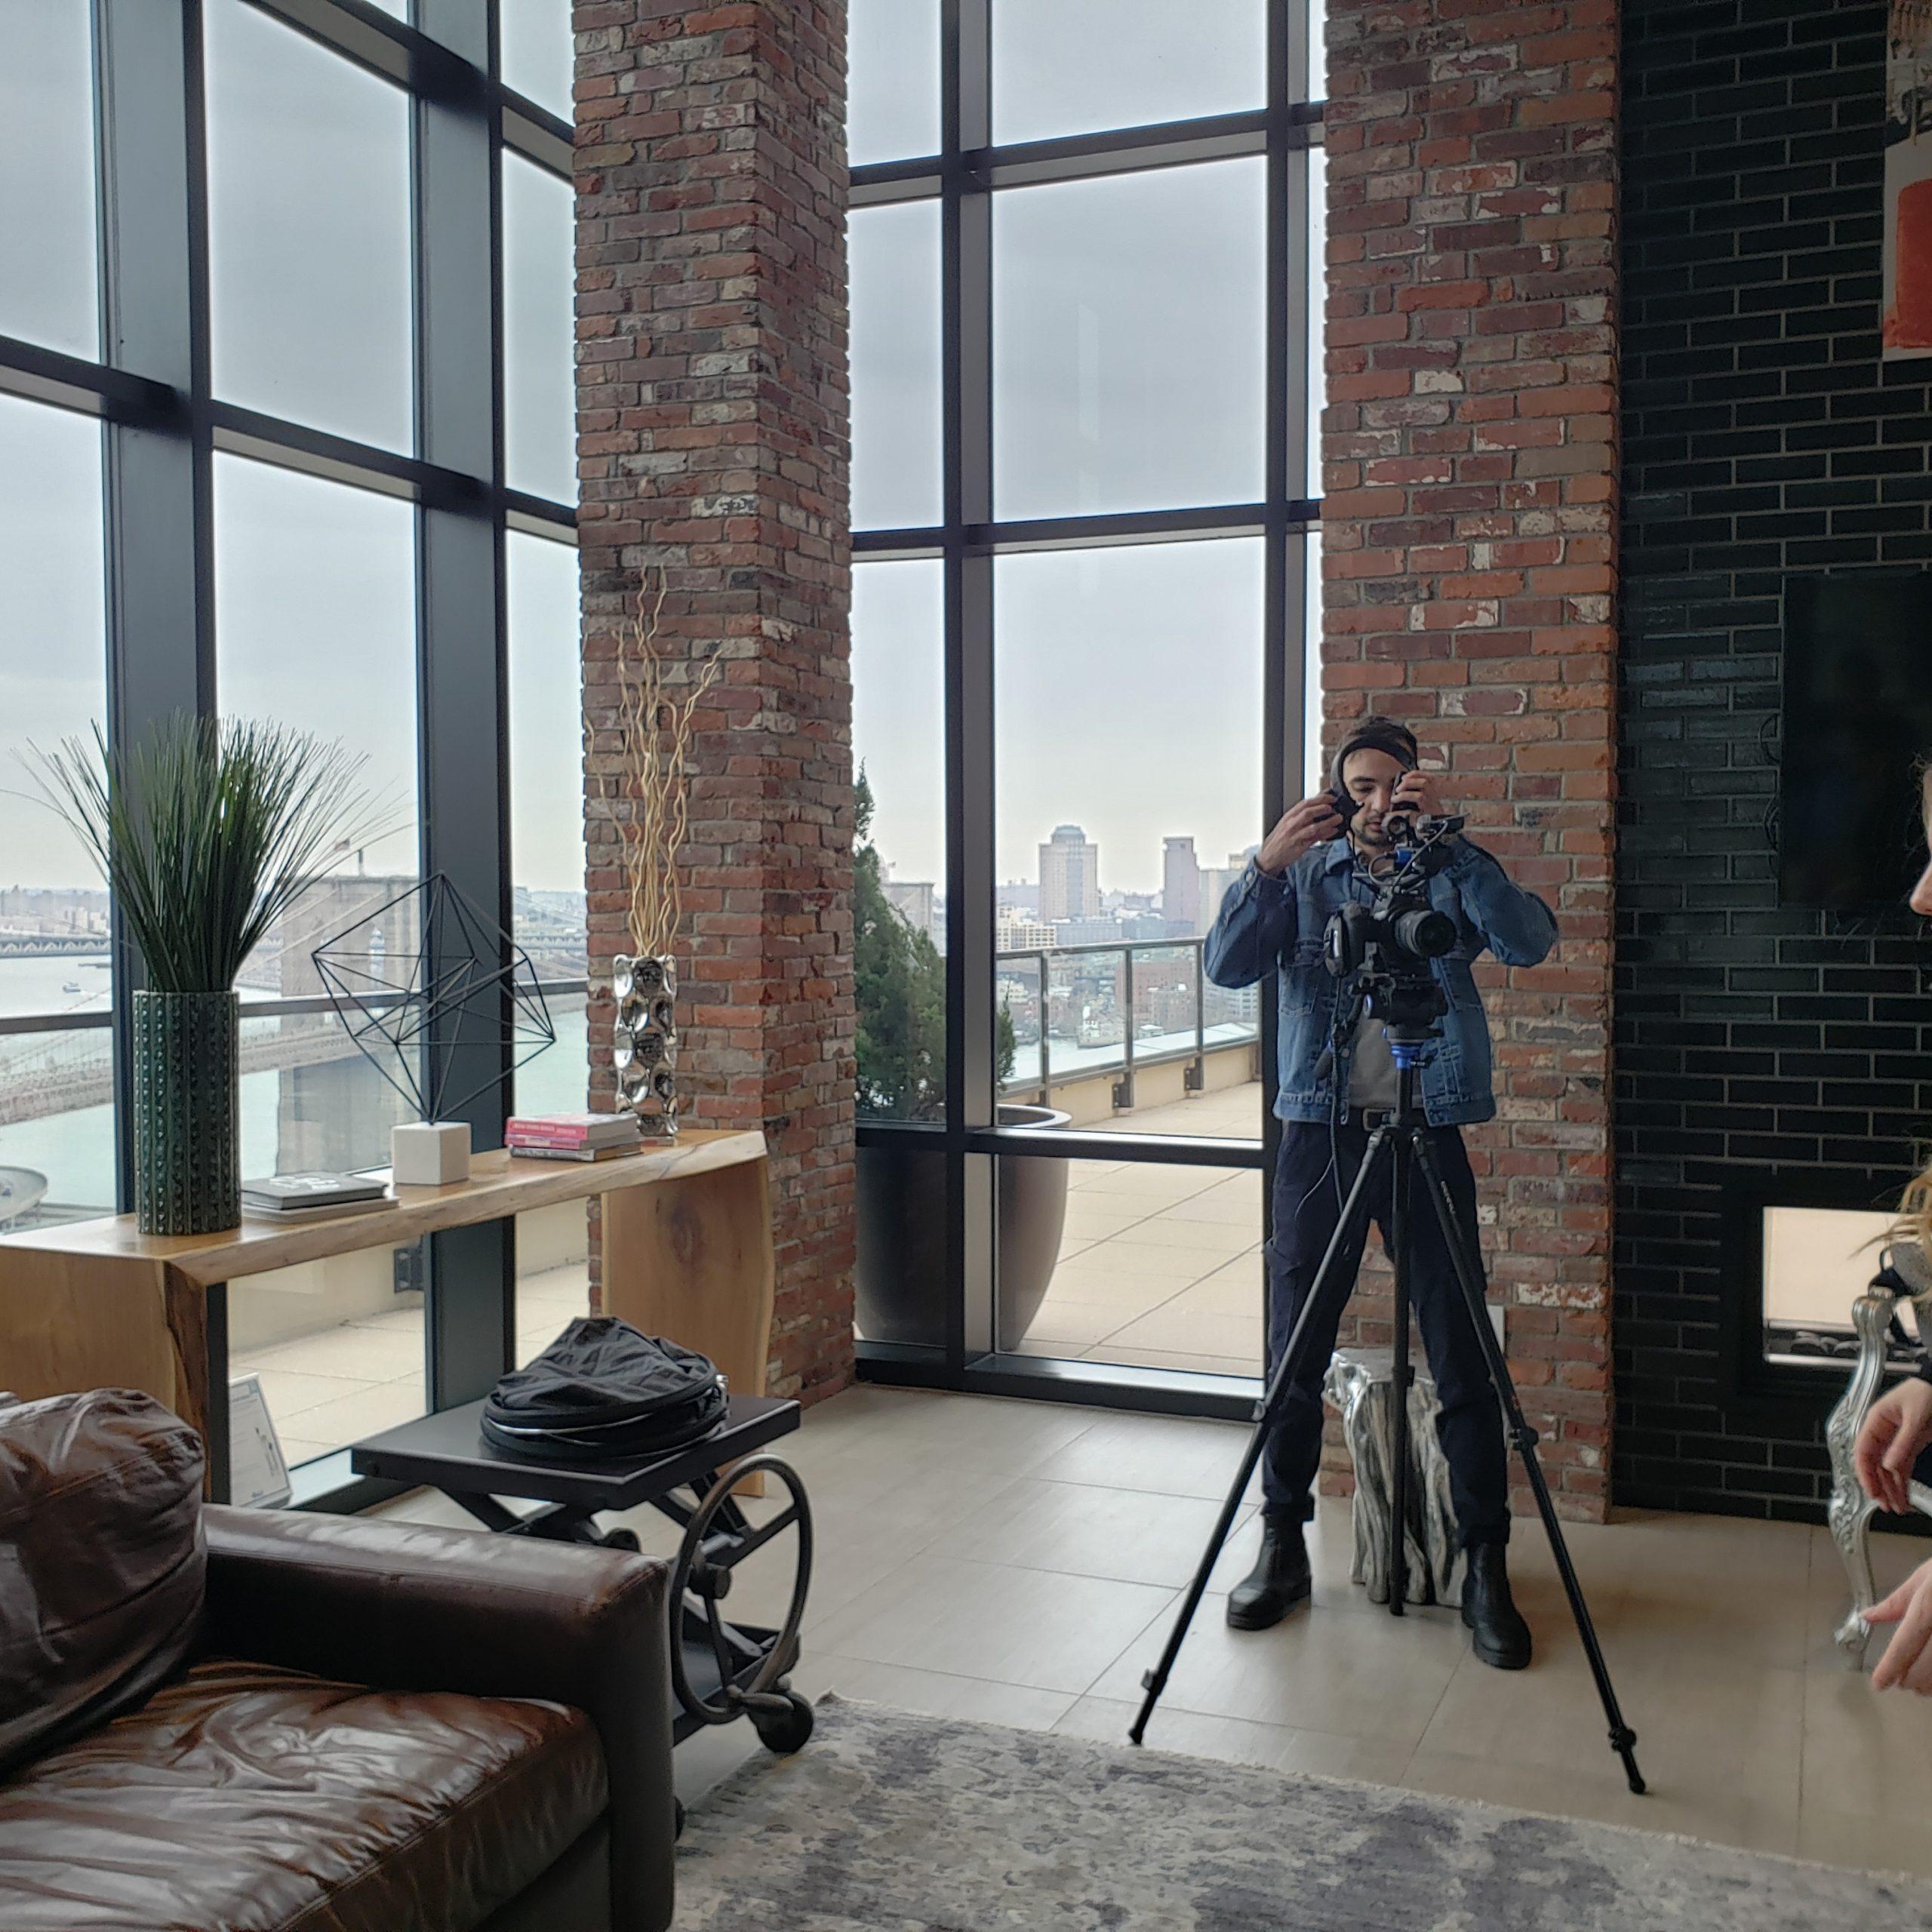 AnswerThePublic – How effective is video marketing